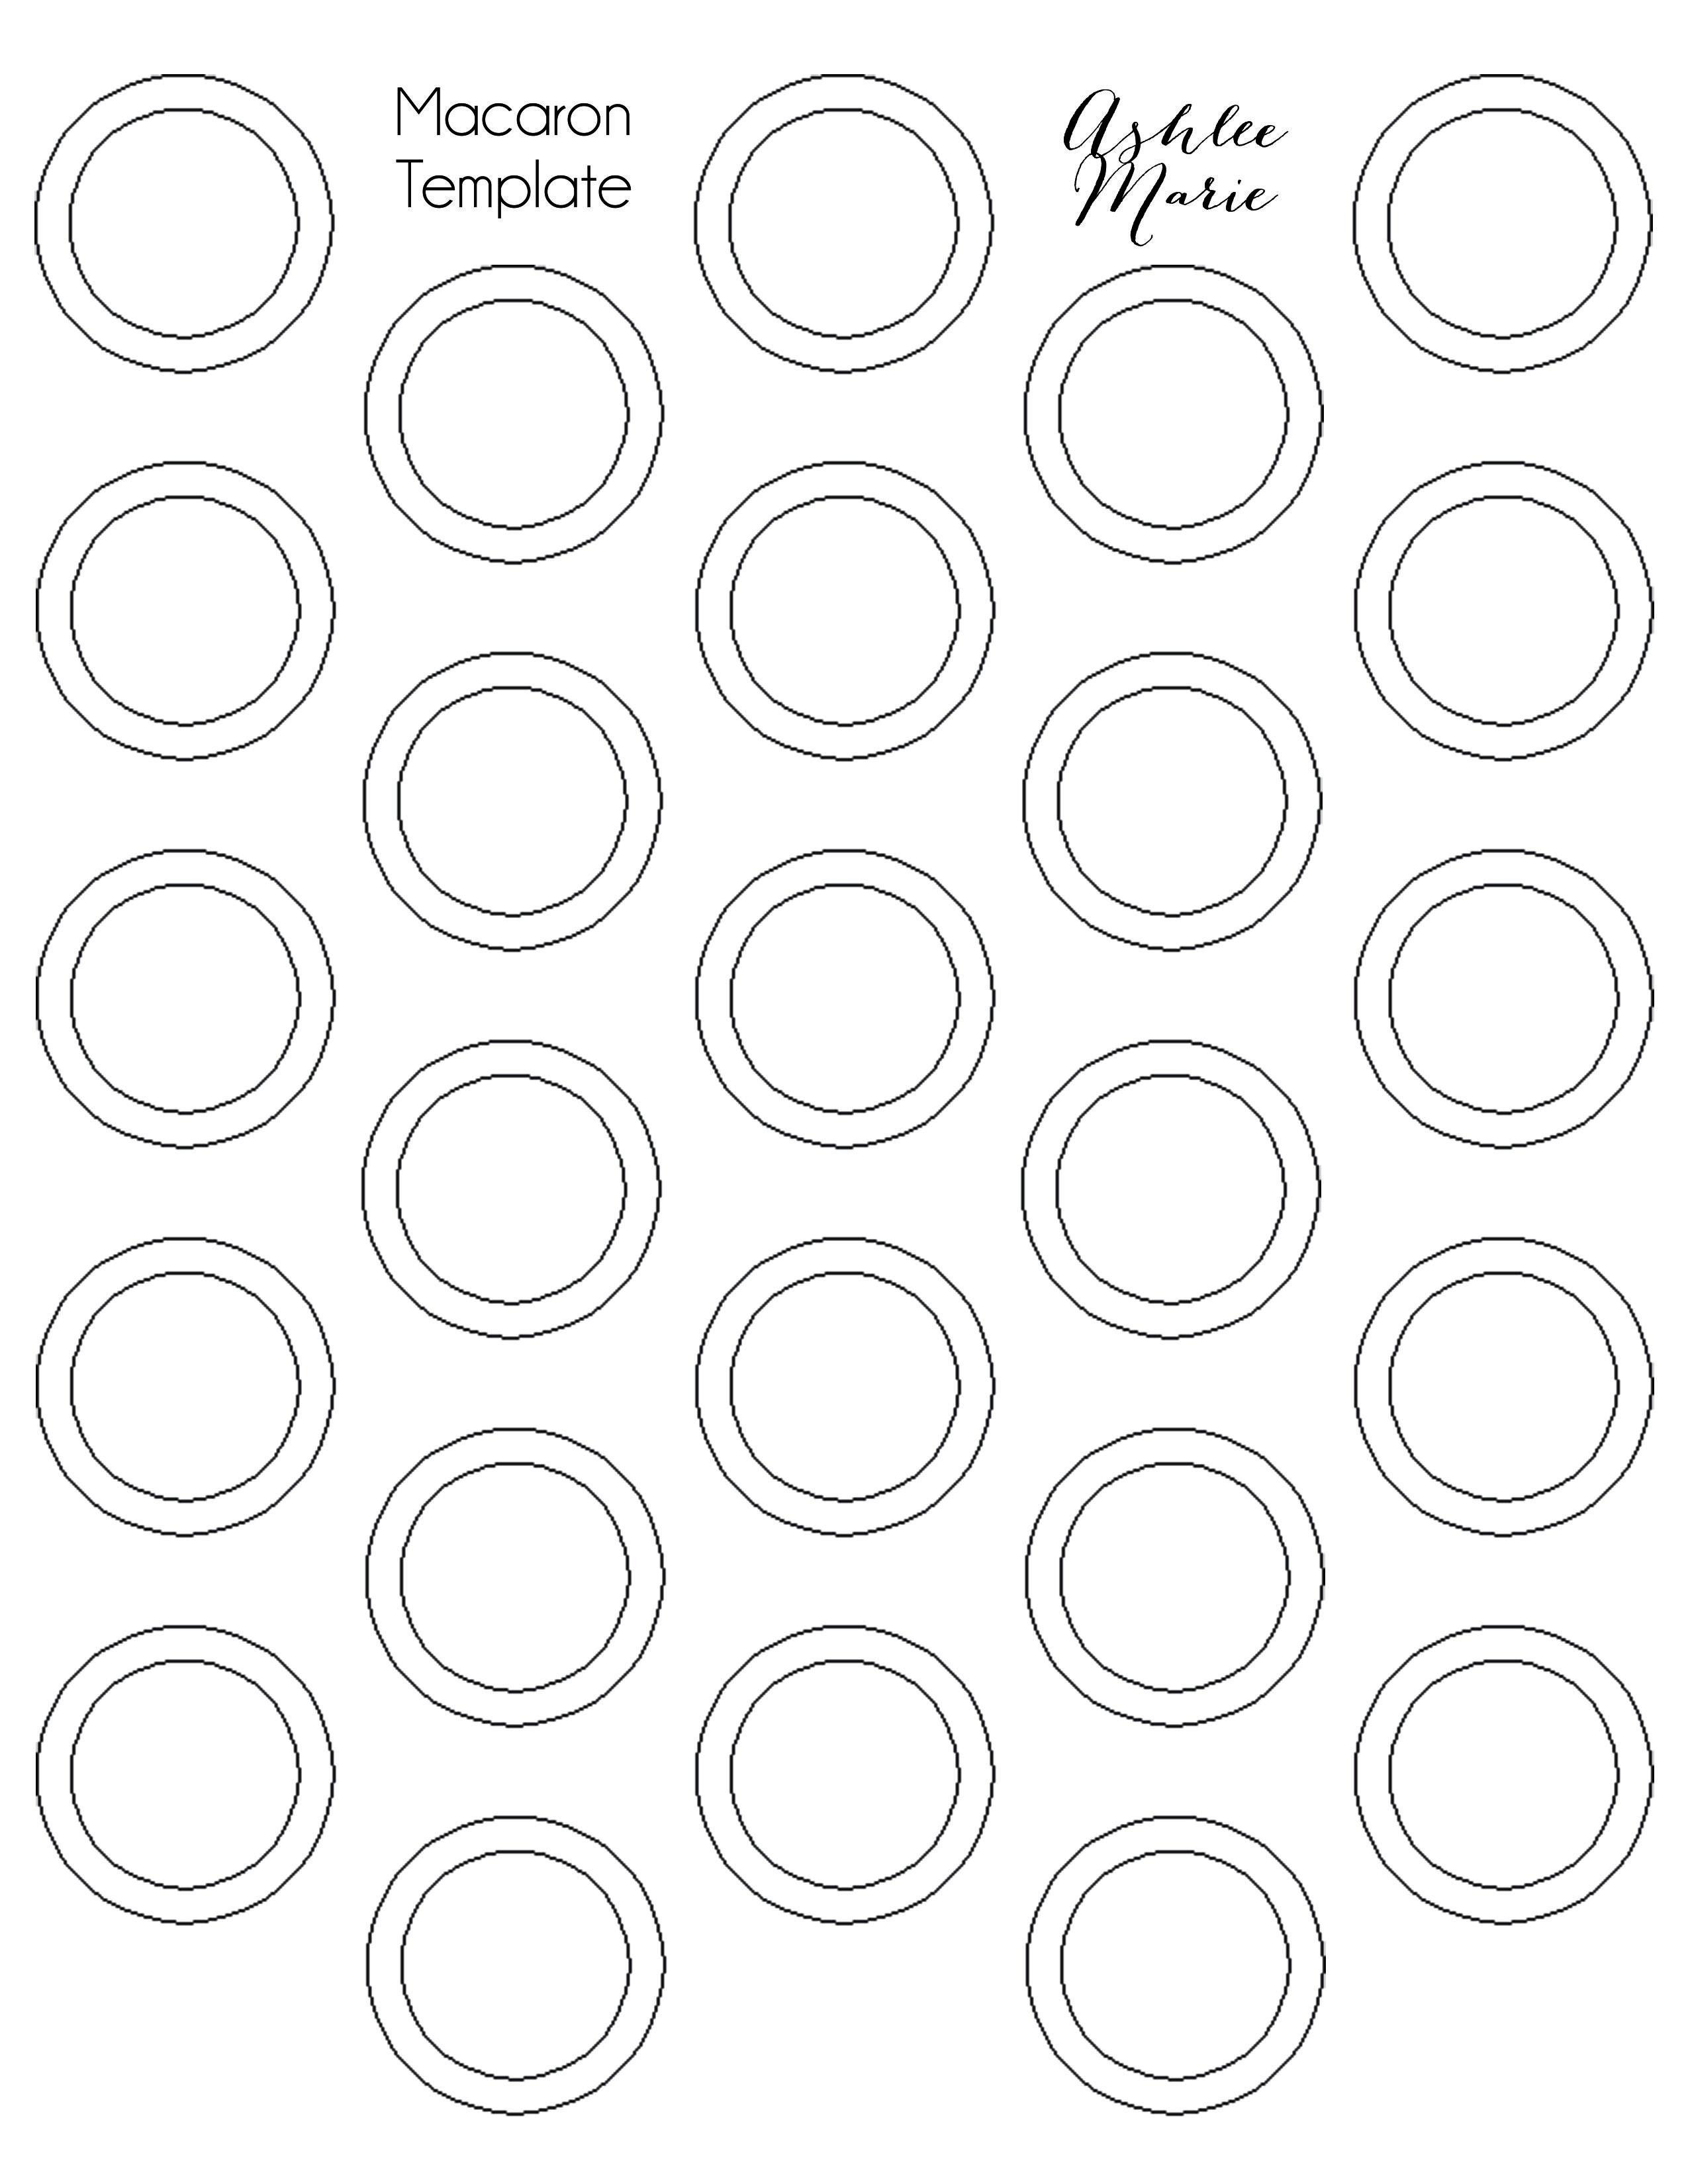 Chocolate Mint Macarons | Ashlee Marie | MƛᏣƛᖇᎧᑎՏ In 2019 - Free Printable Macaron Template